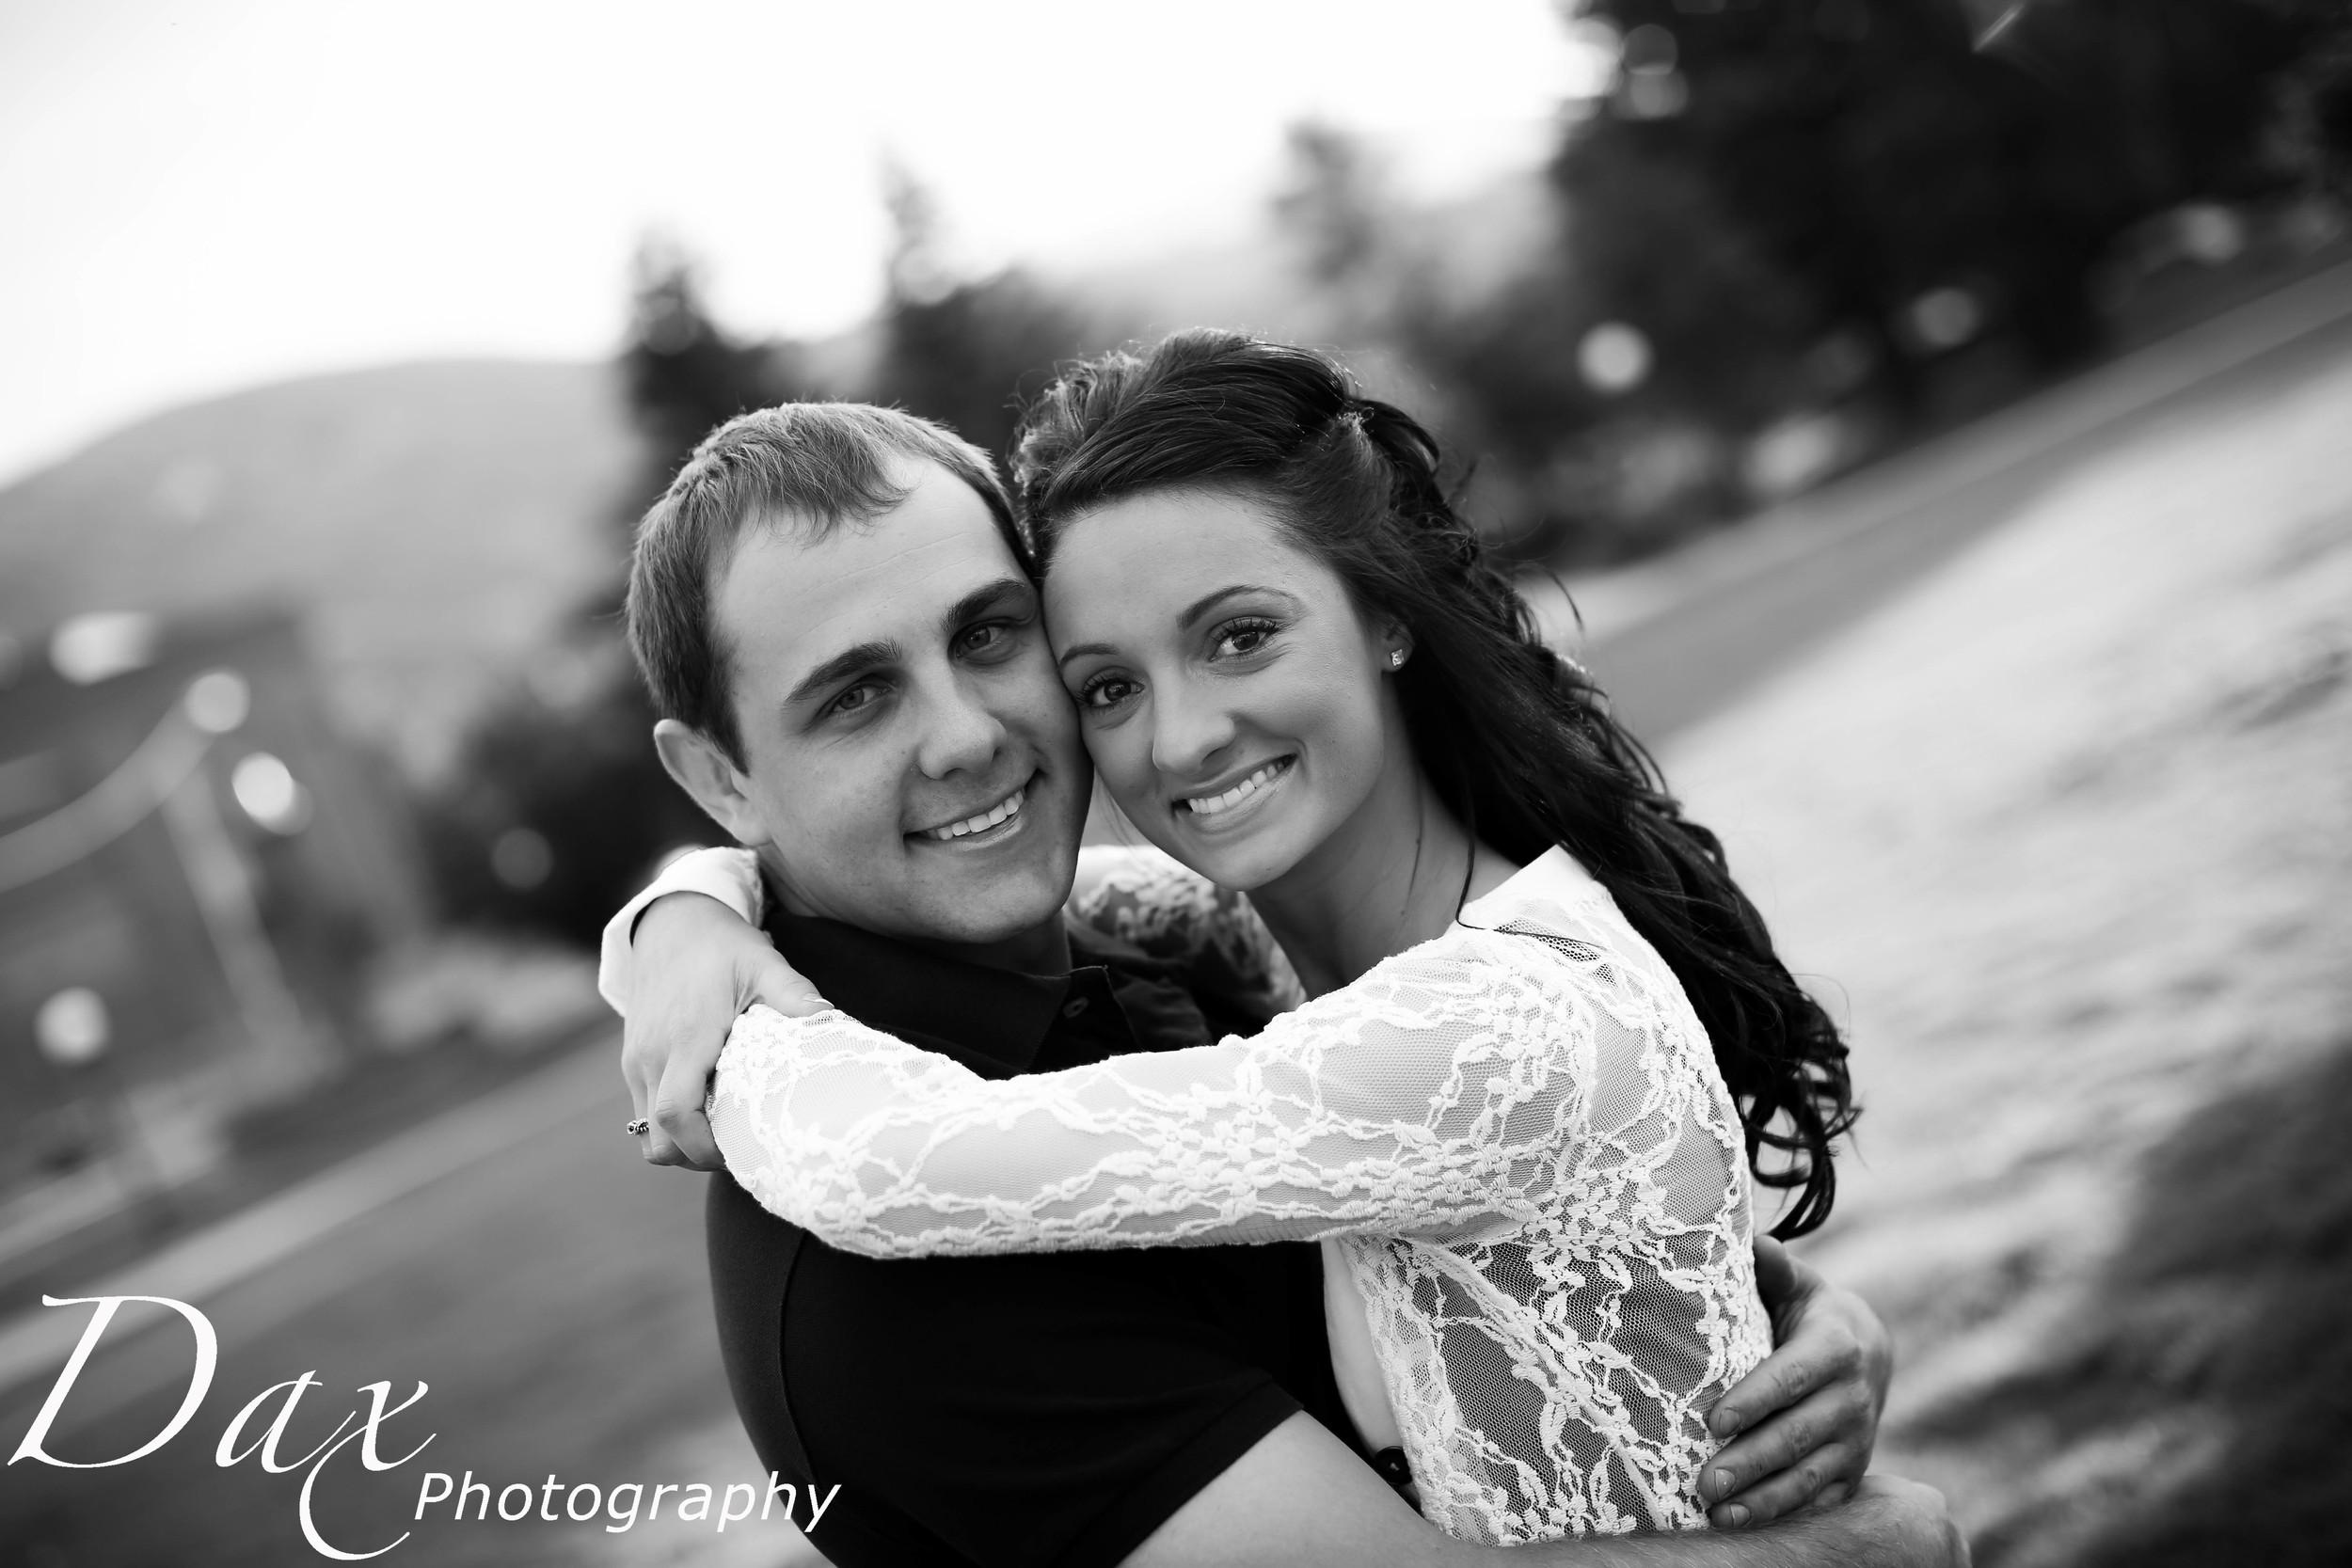 wpid-Montana-photographer-Engagement-Portrait-42971.jpg